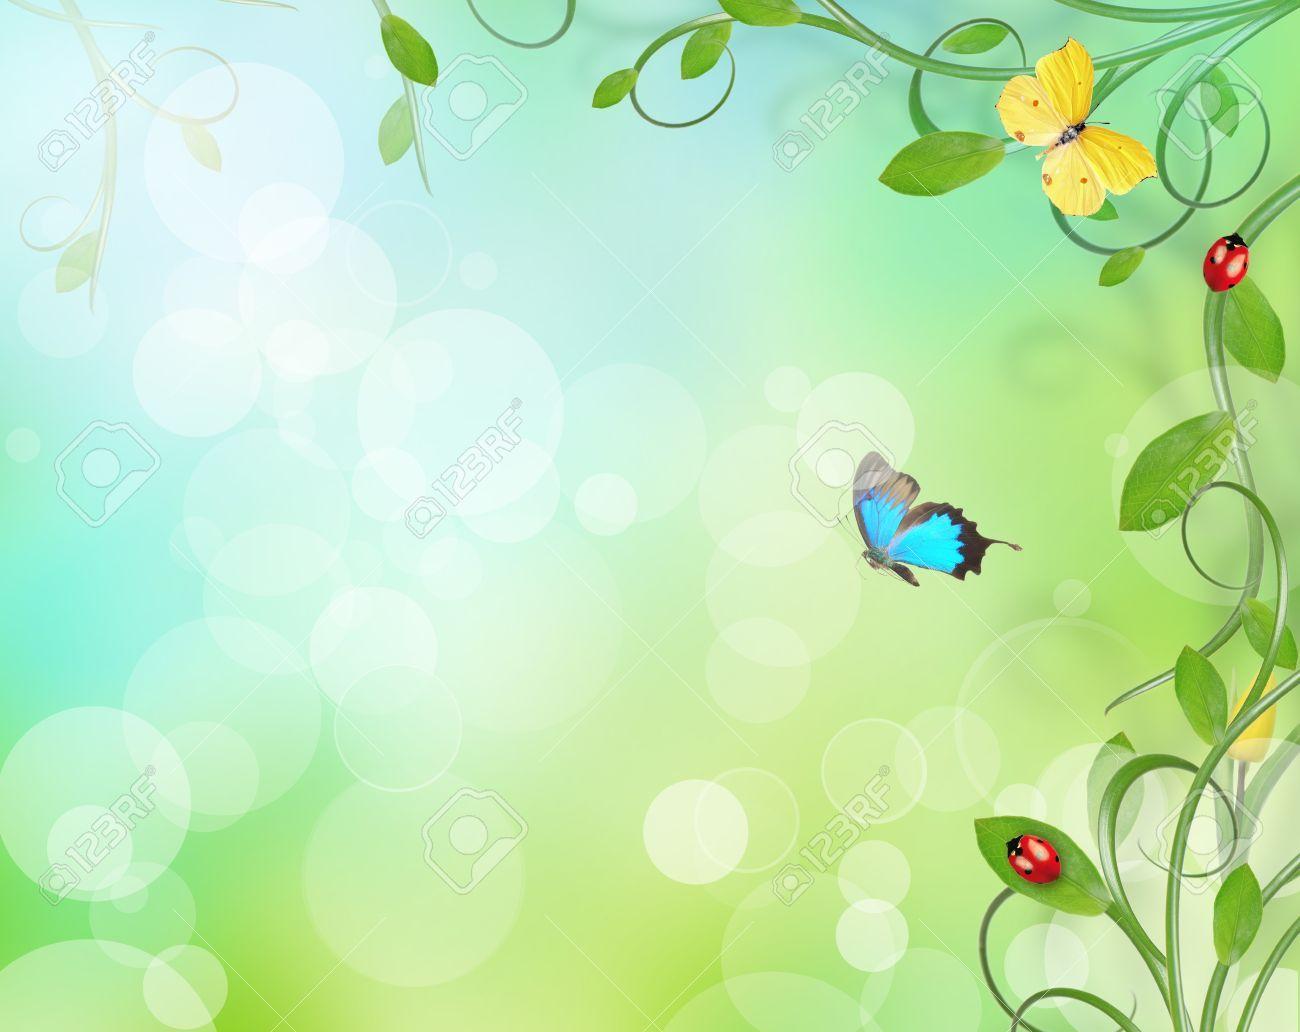 Image result for butterfly flower border | Everything Else ...